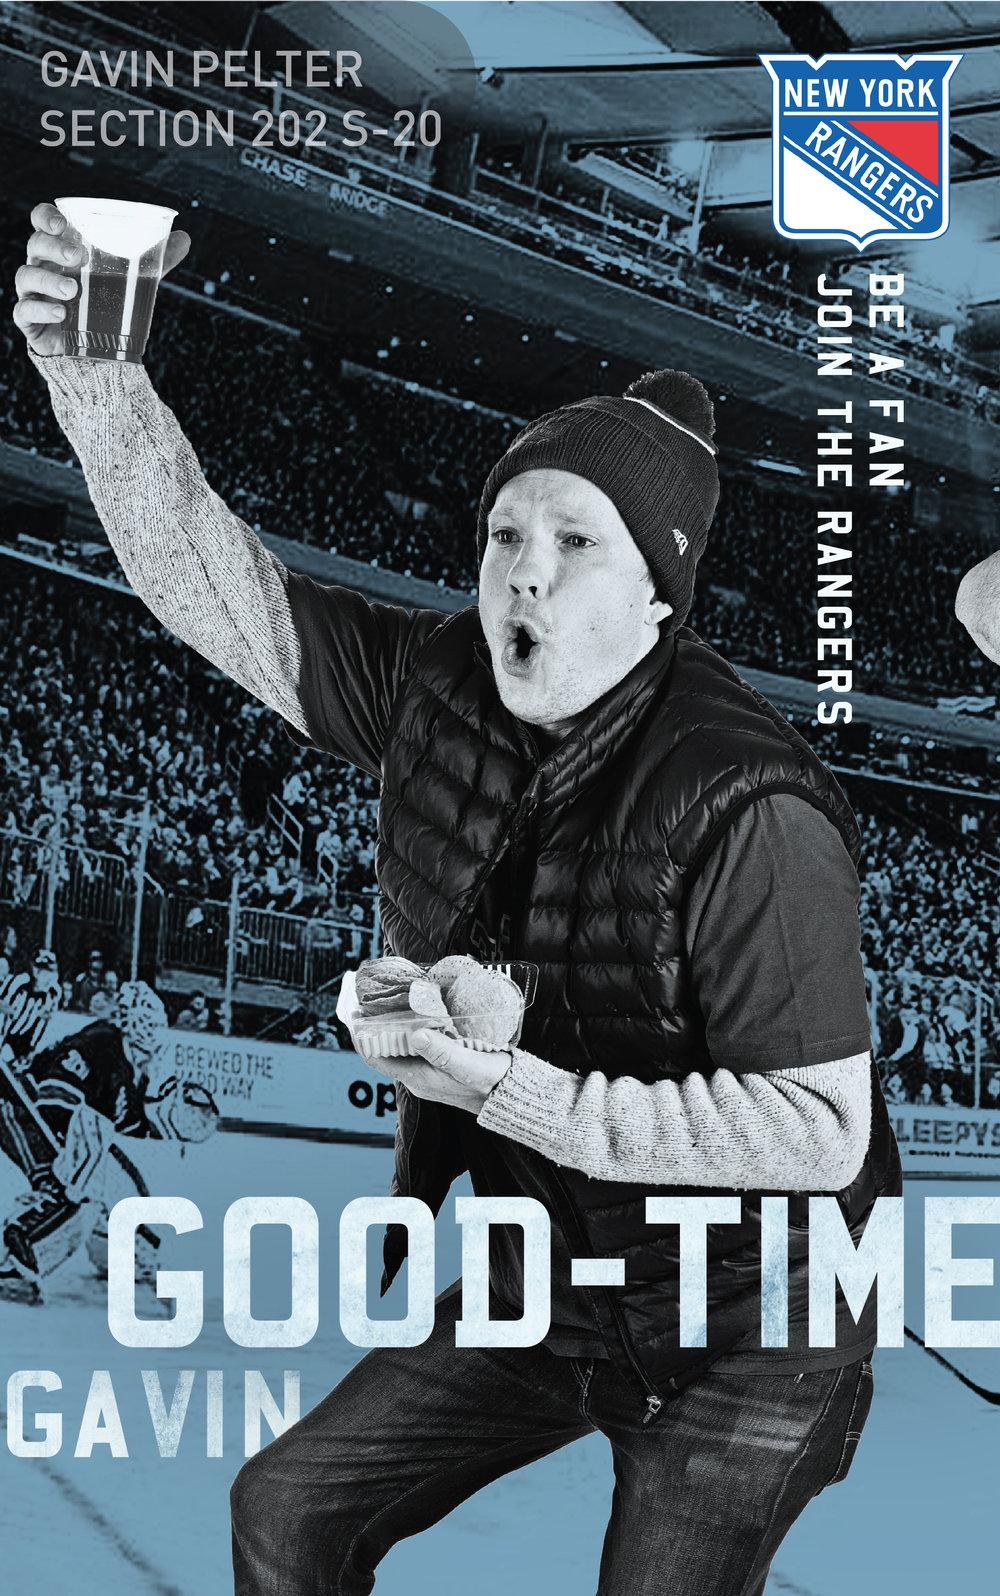 posters_NHL_indepedentstudy_qt6-07.jpg